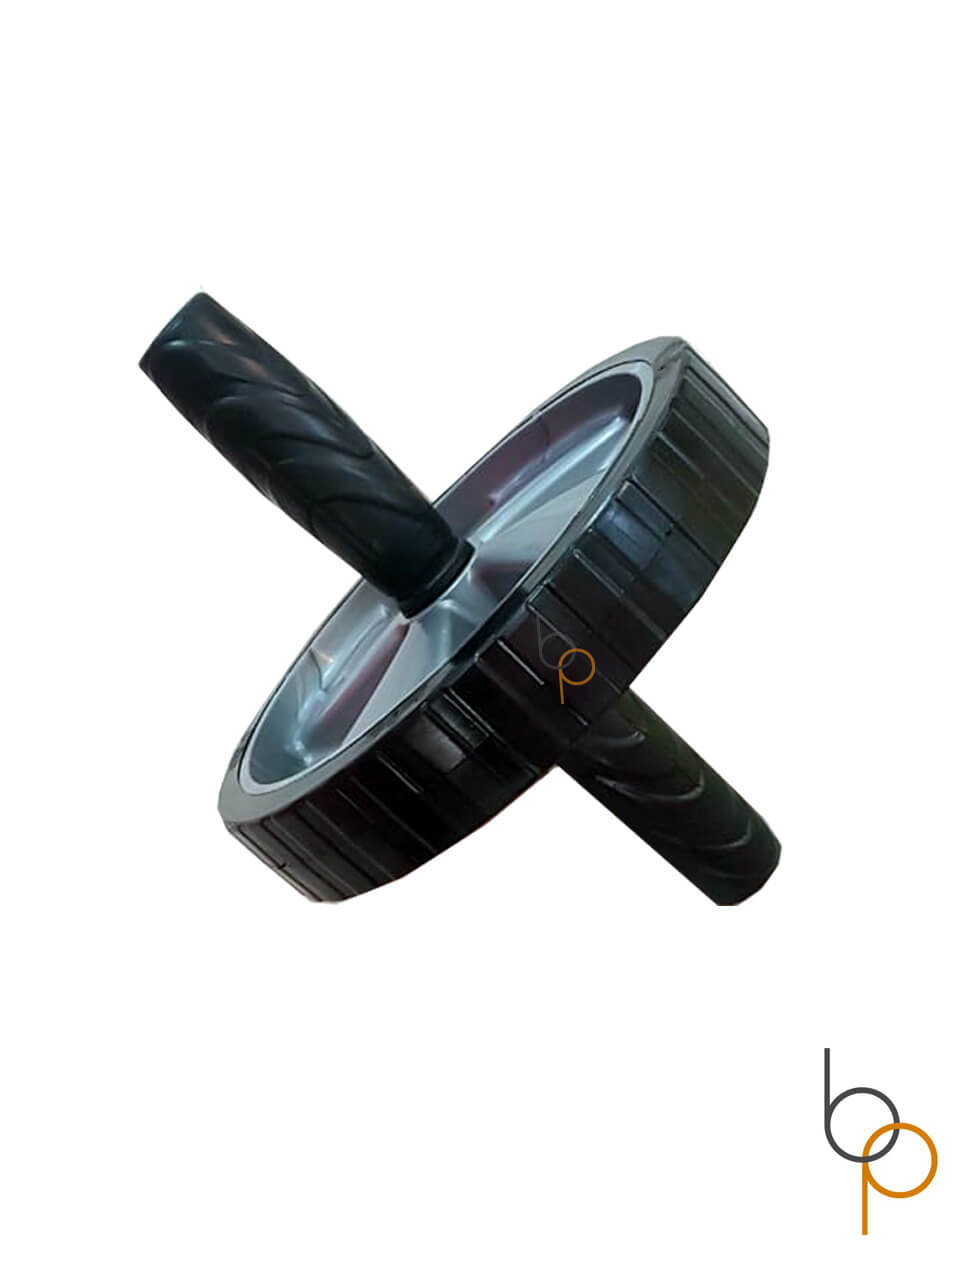 roda de abdominal Exercícios Funcional Aerofitness